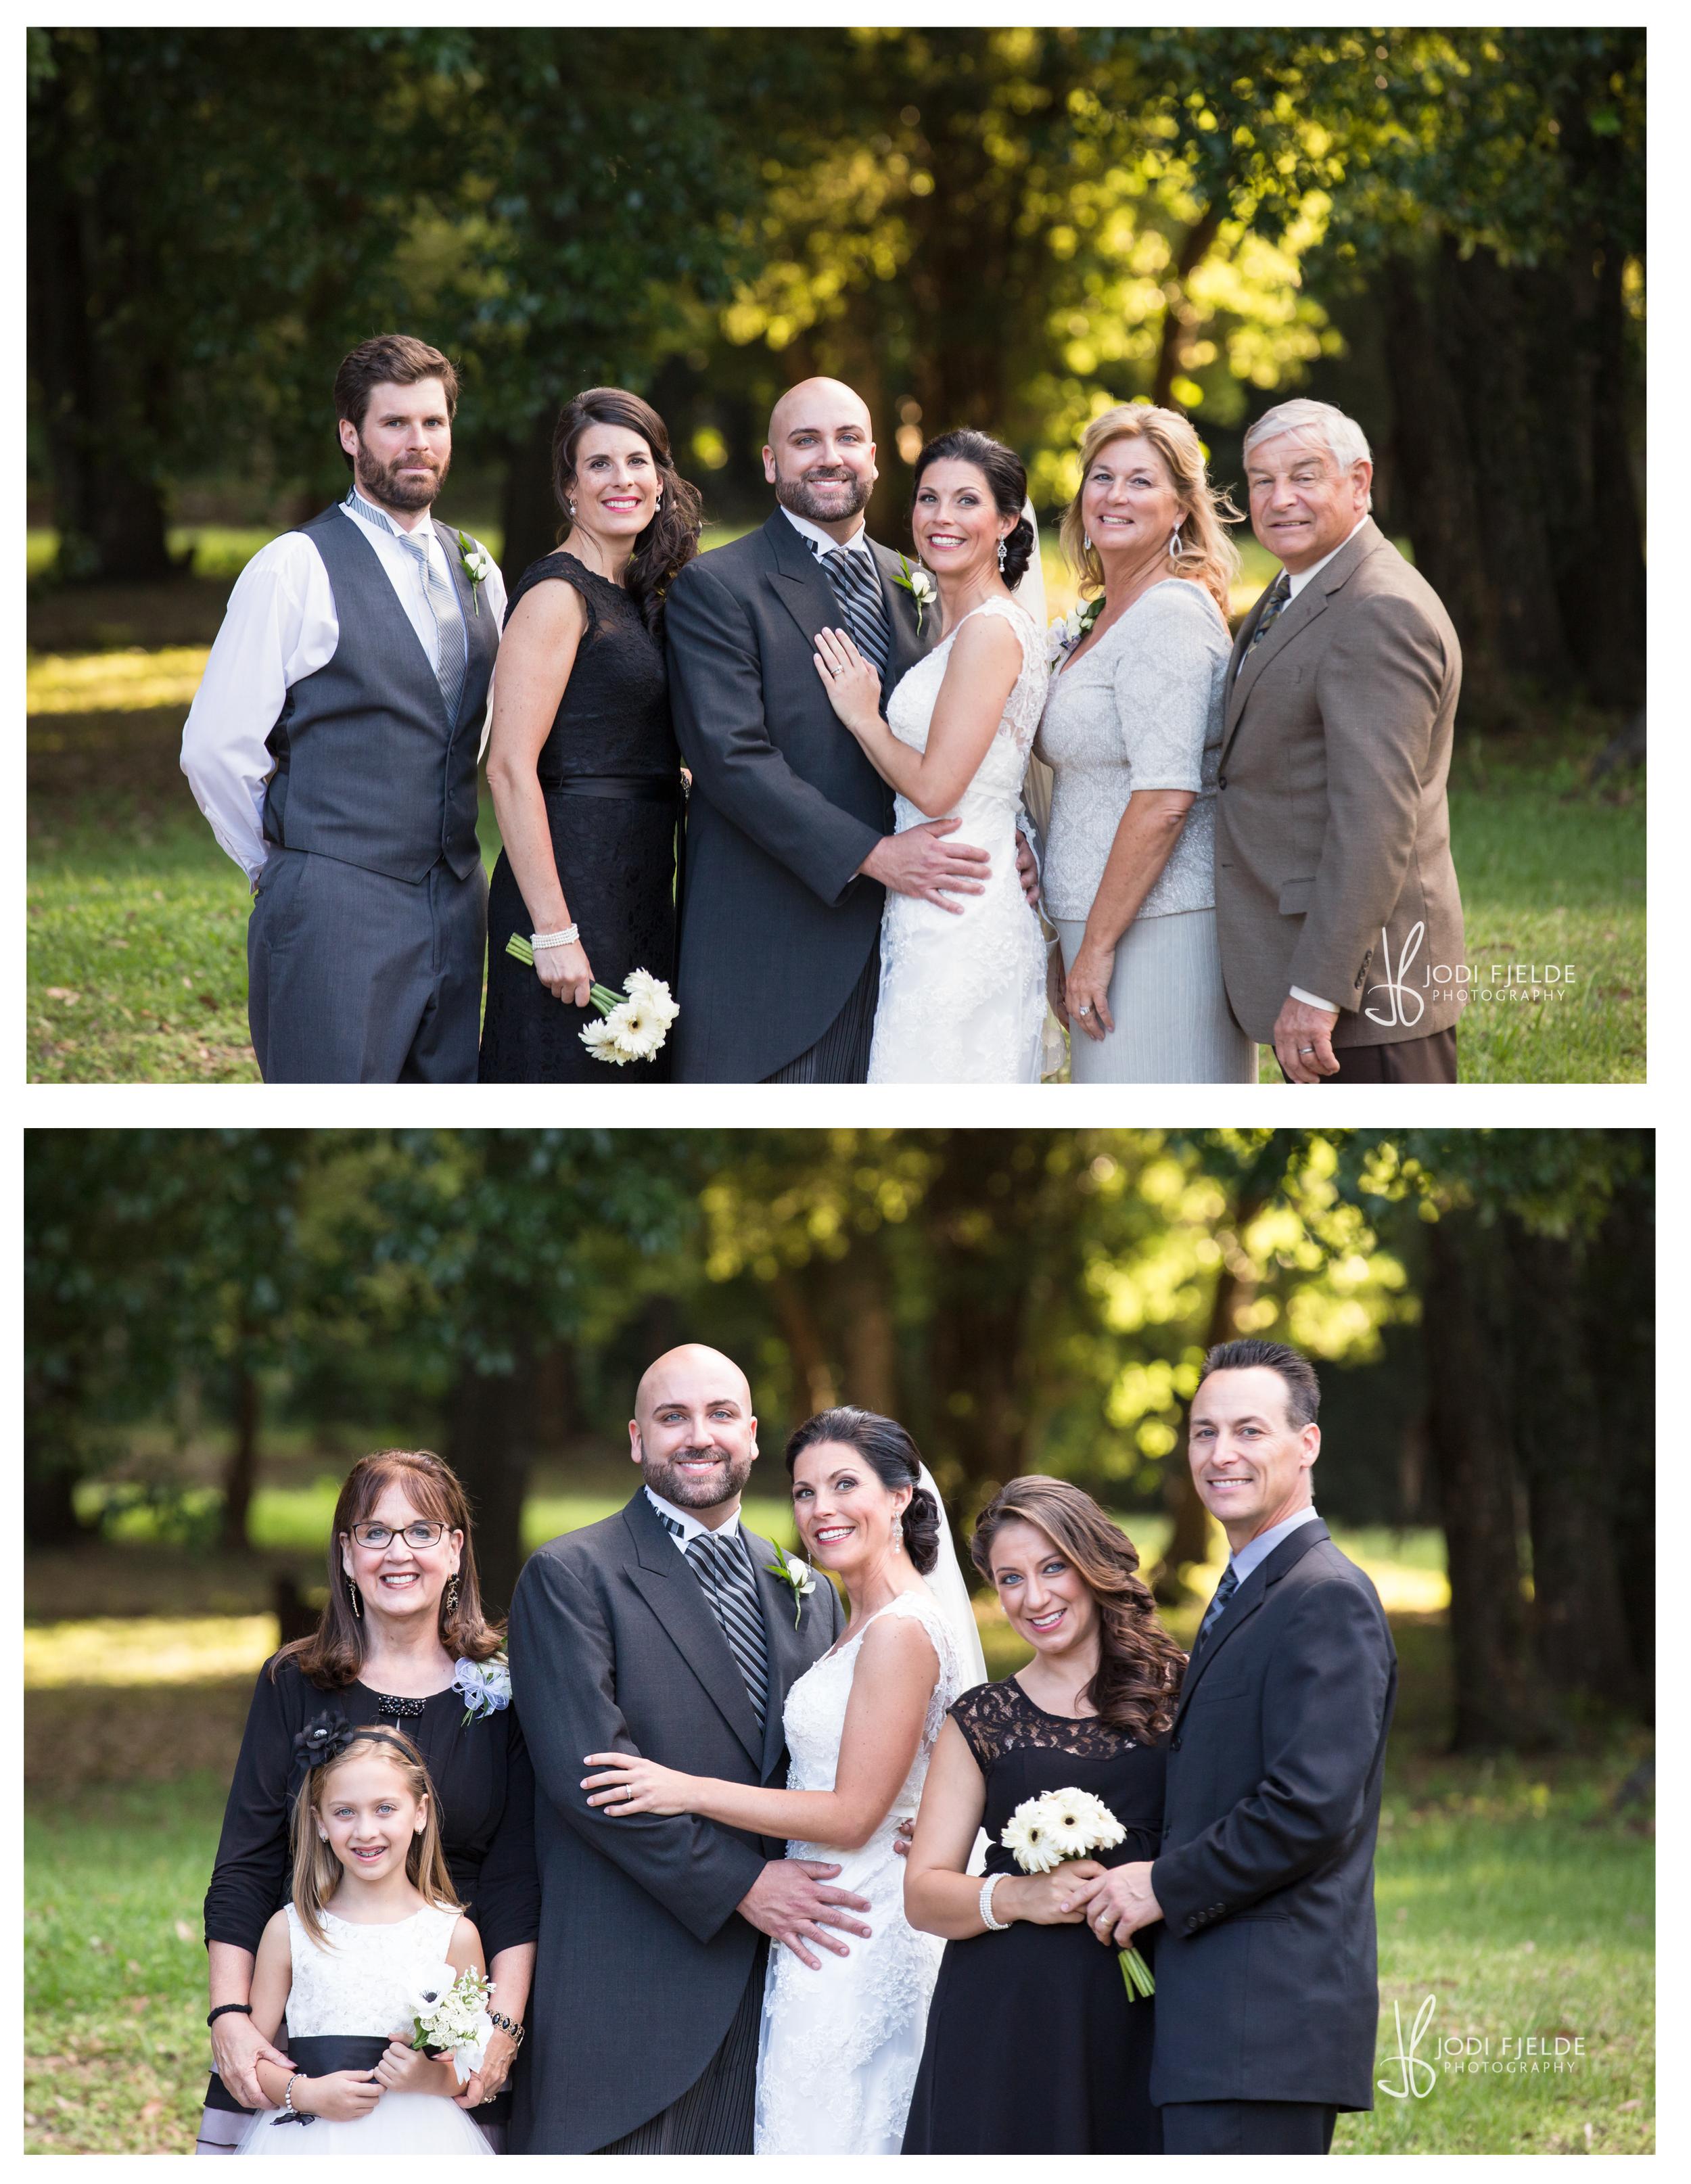 Highland_Manor_Apopka_Florida_wedding_Jackie_&_Tim_photography_jodi_Fjelde_photography-20.jpg